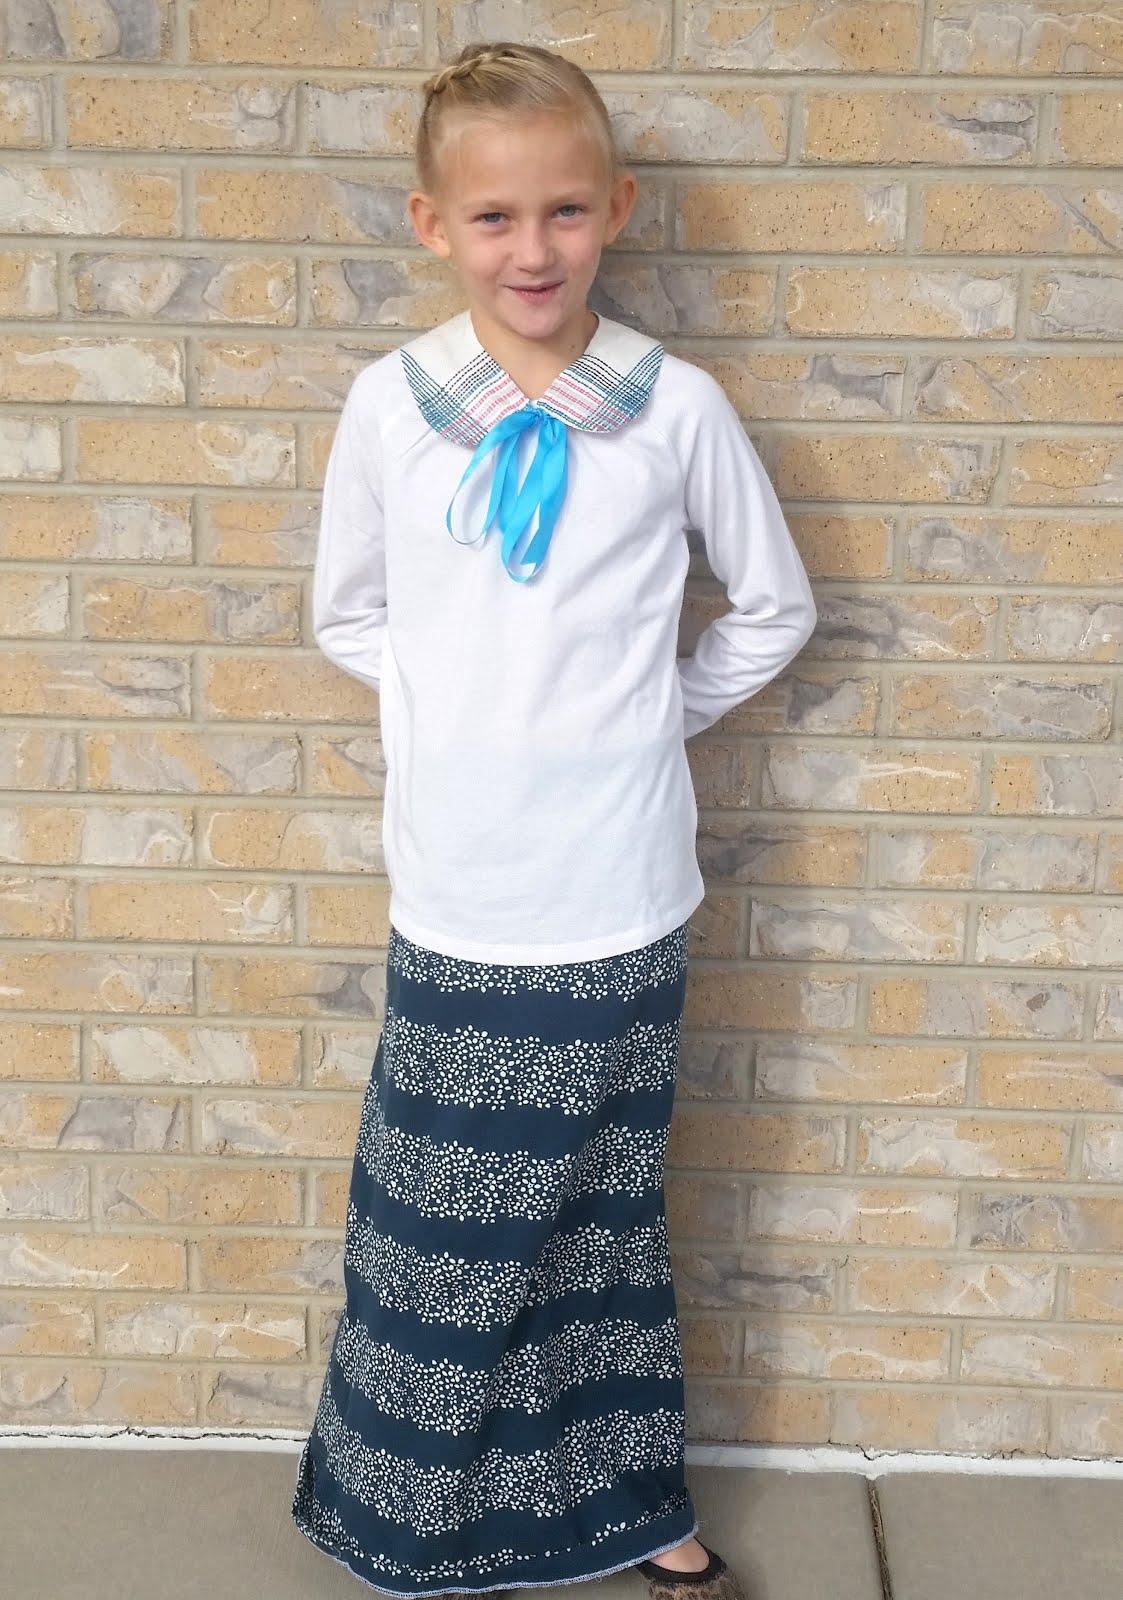 Wonderful Art Gallery Fabrics Christmas outfits for the kids! CUTE  BU24